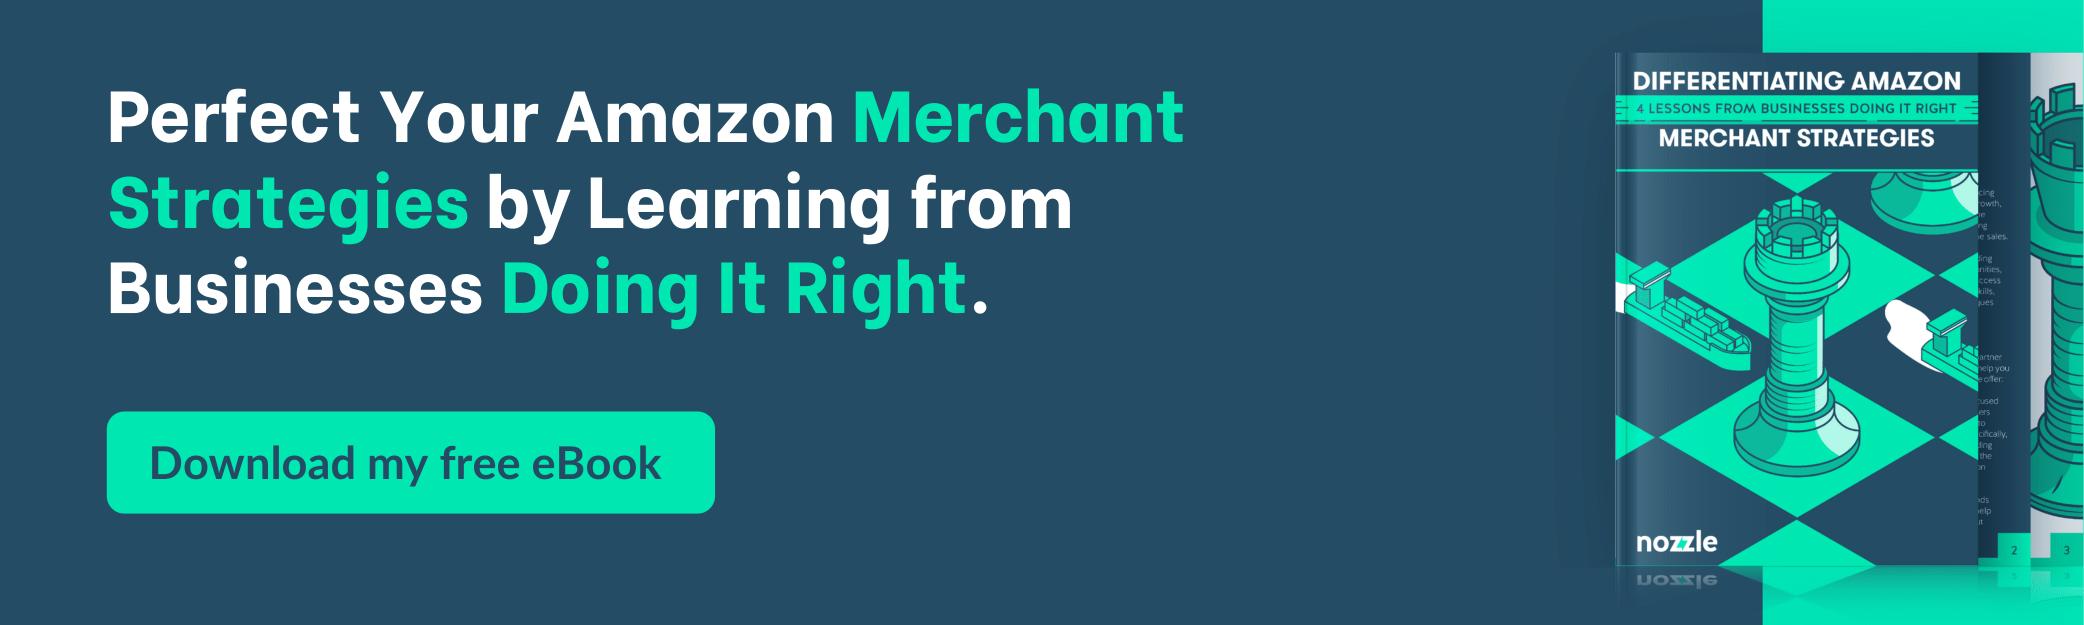 Merchant Strategies eBook CTA